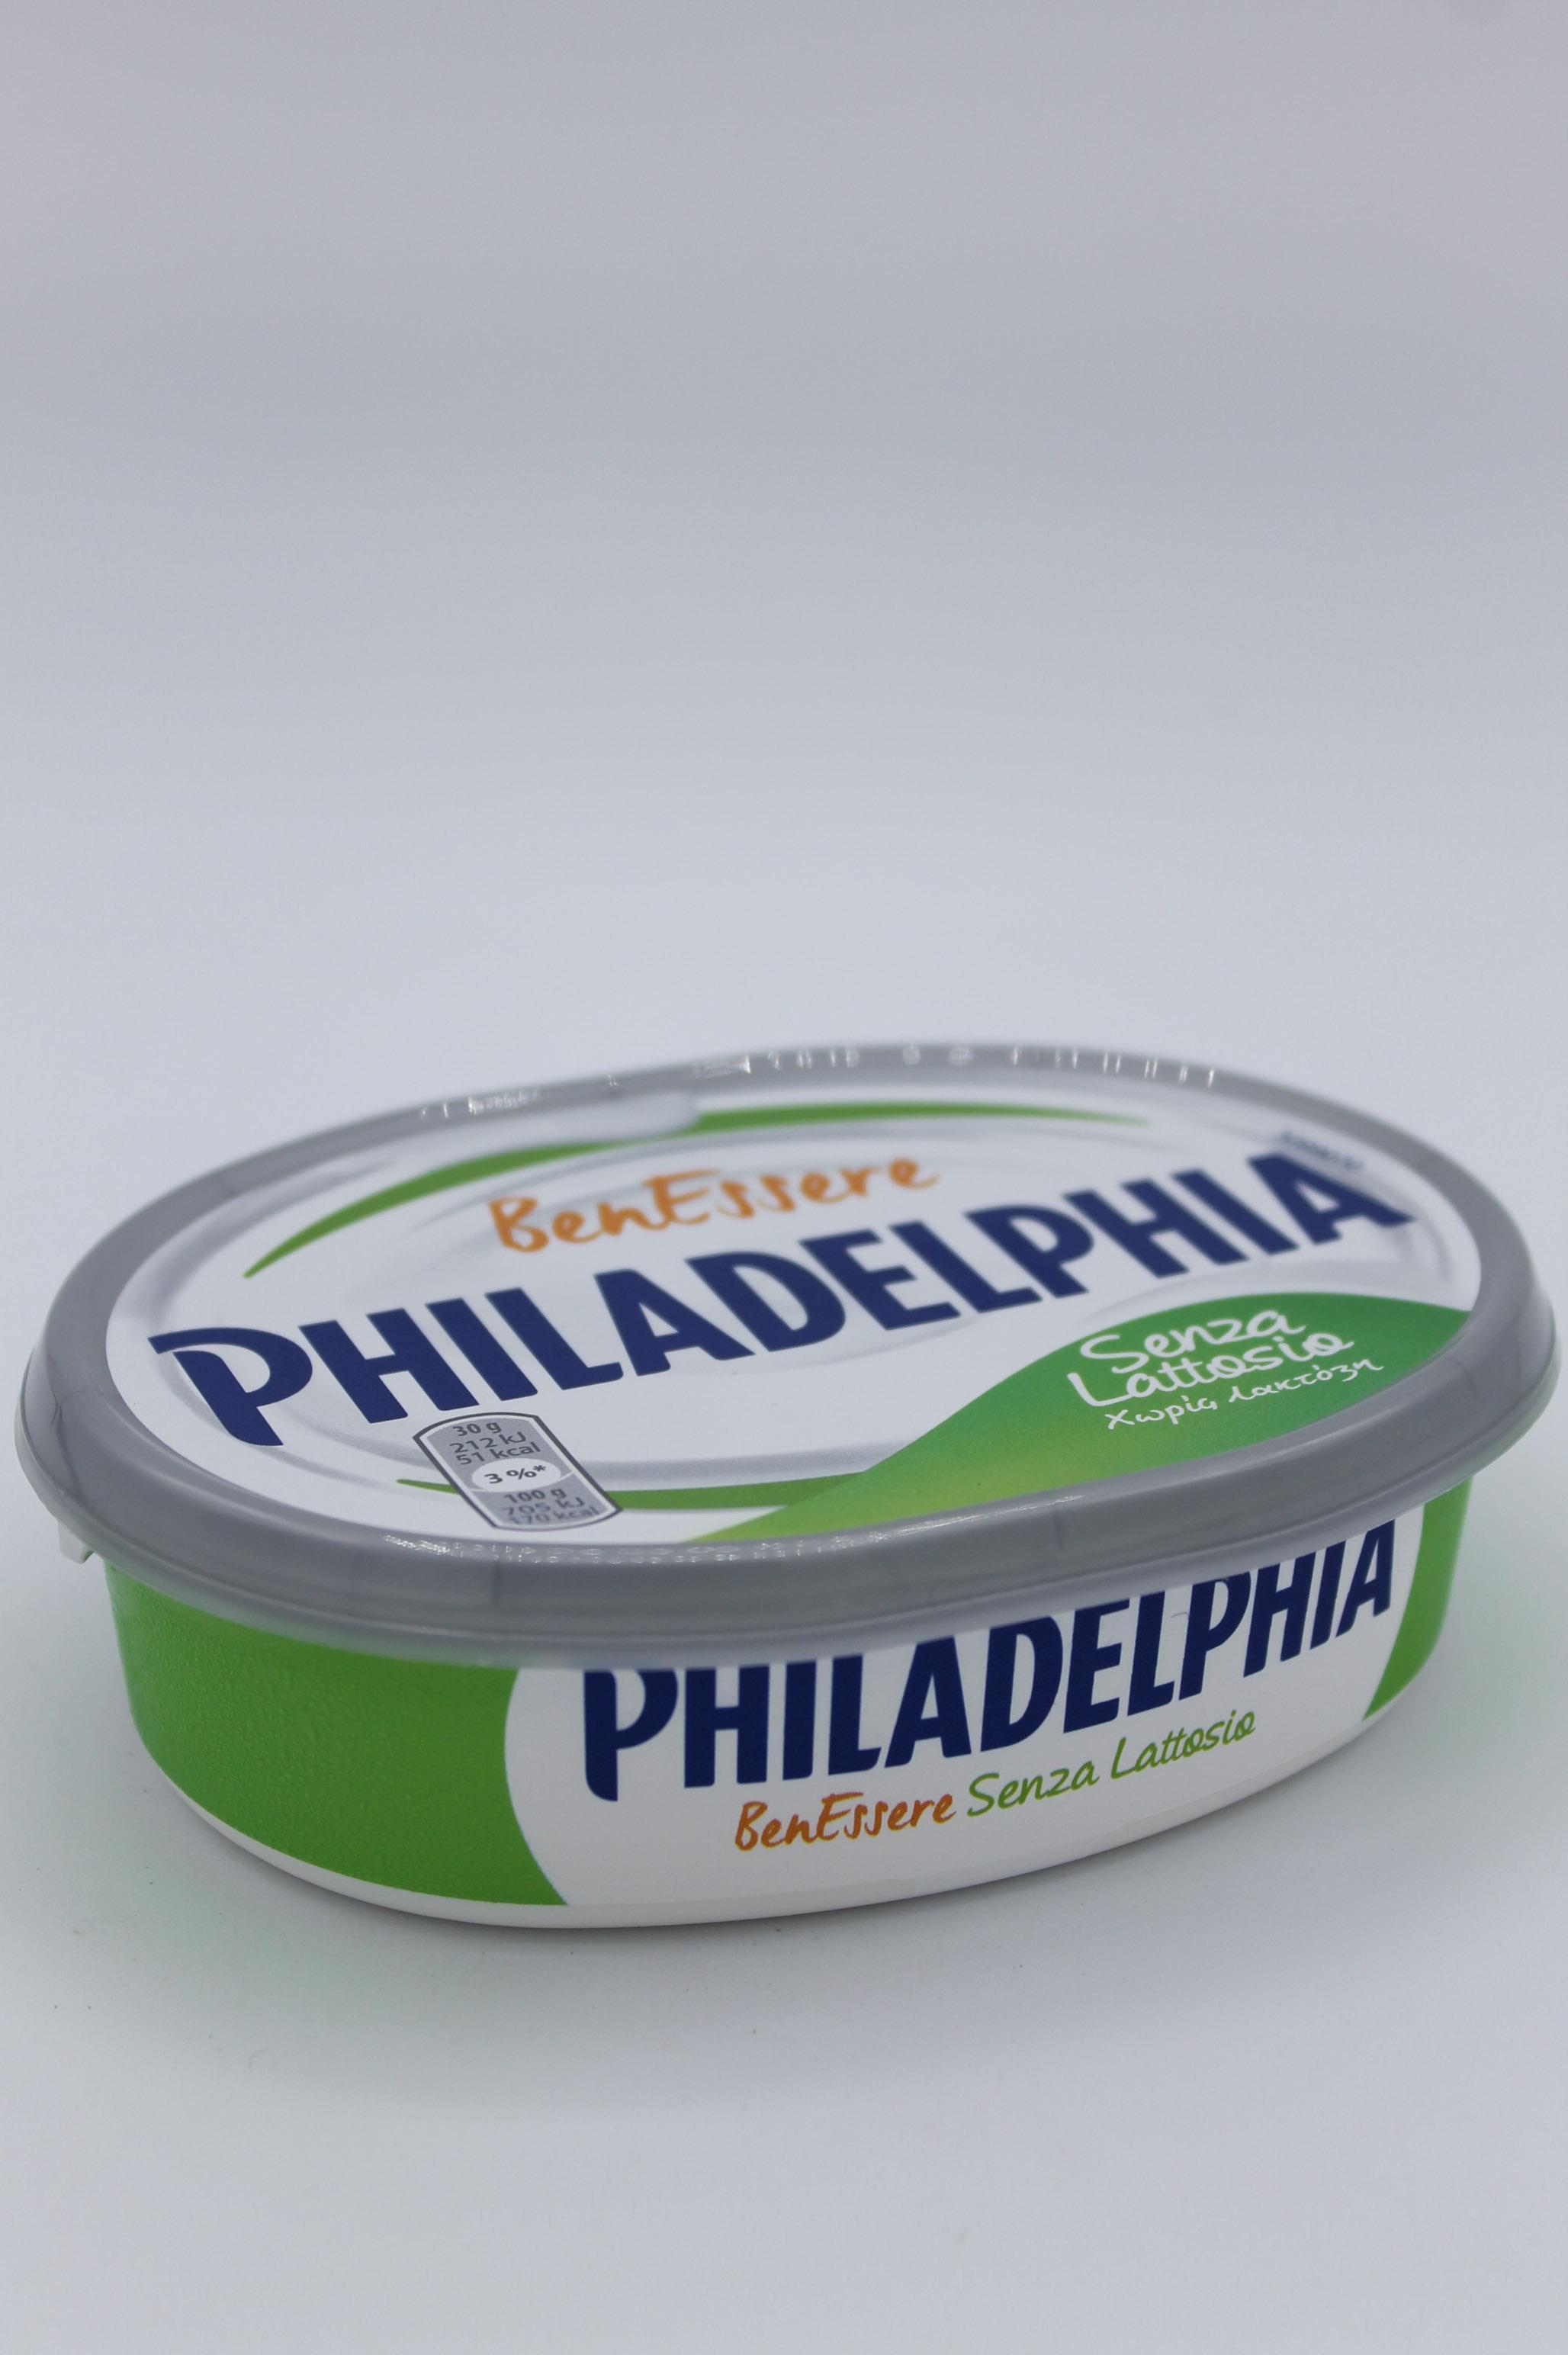 Philadelphia senza lattosio 175gr.